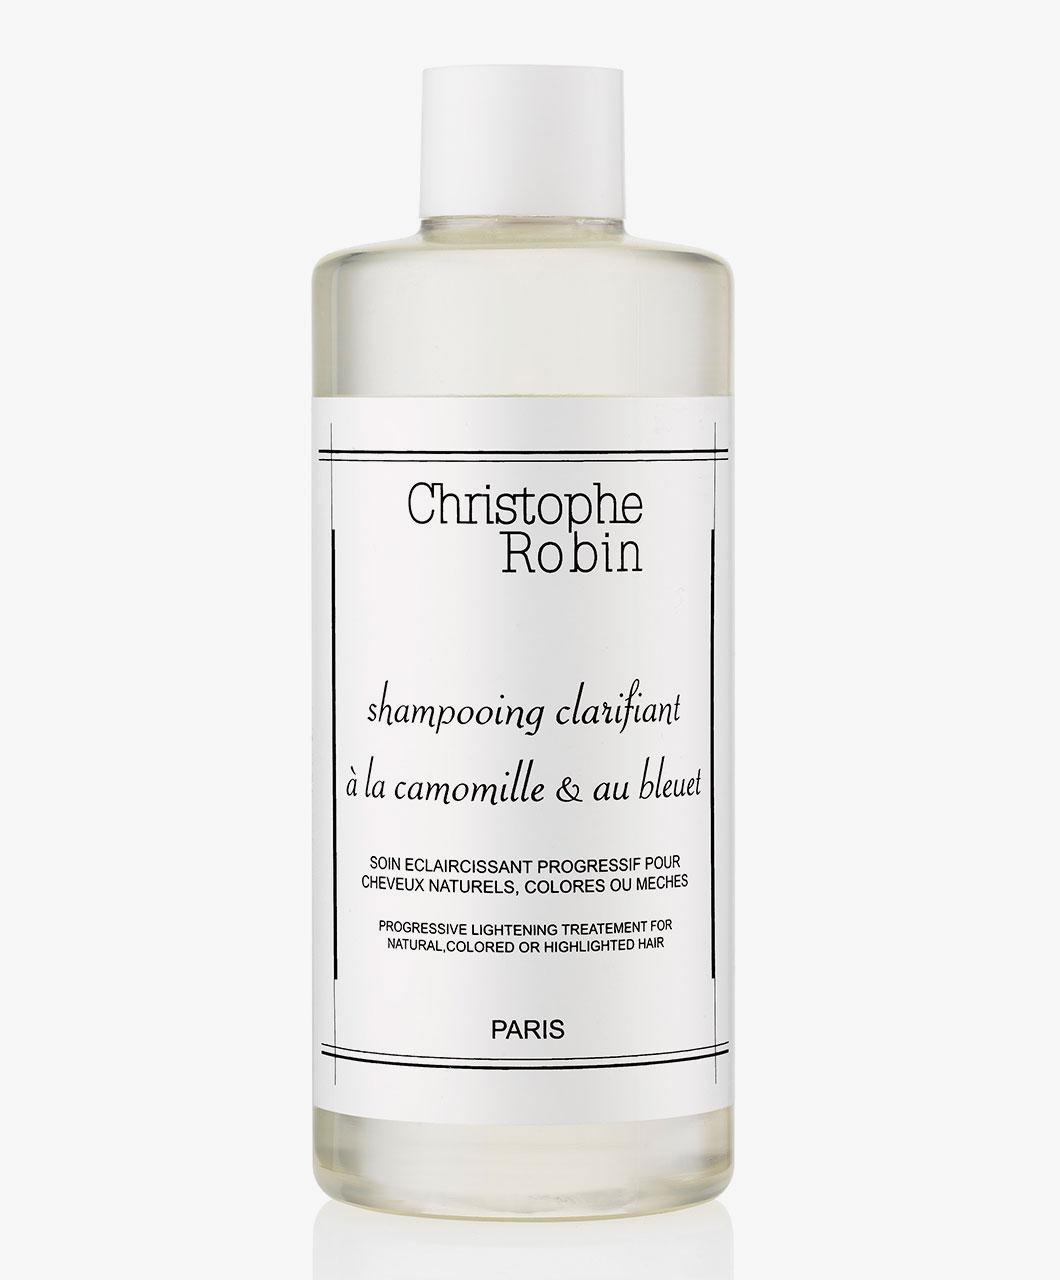 Afbeelding van Christophe Robin Clarifying Shampoo with Camomile & Cornflower